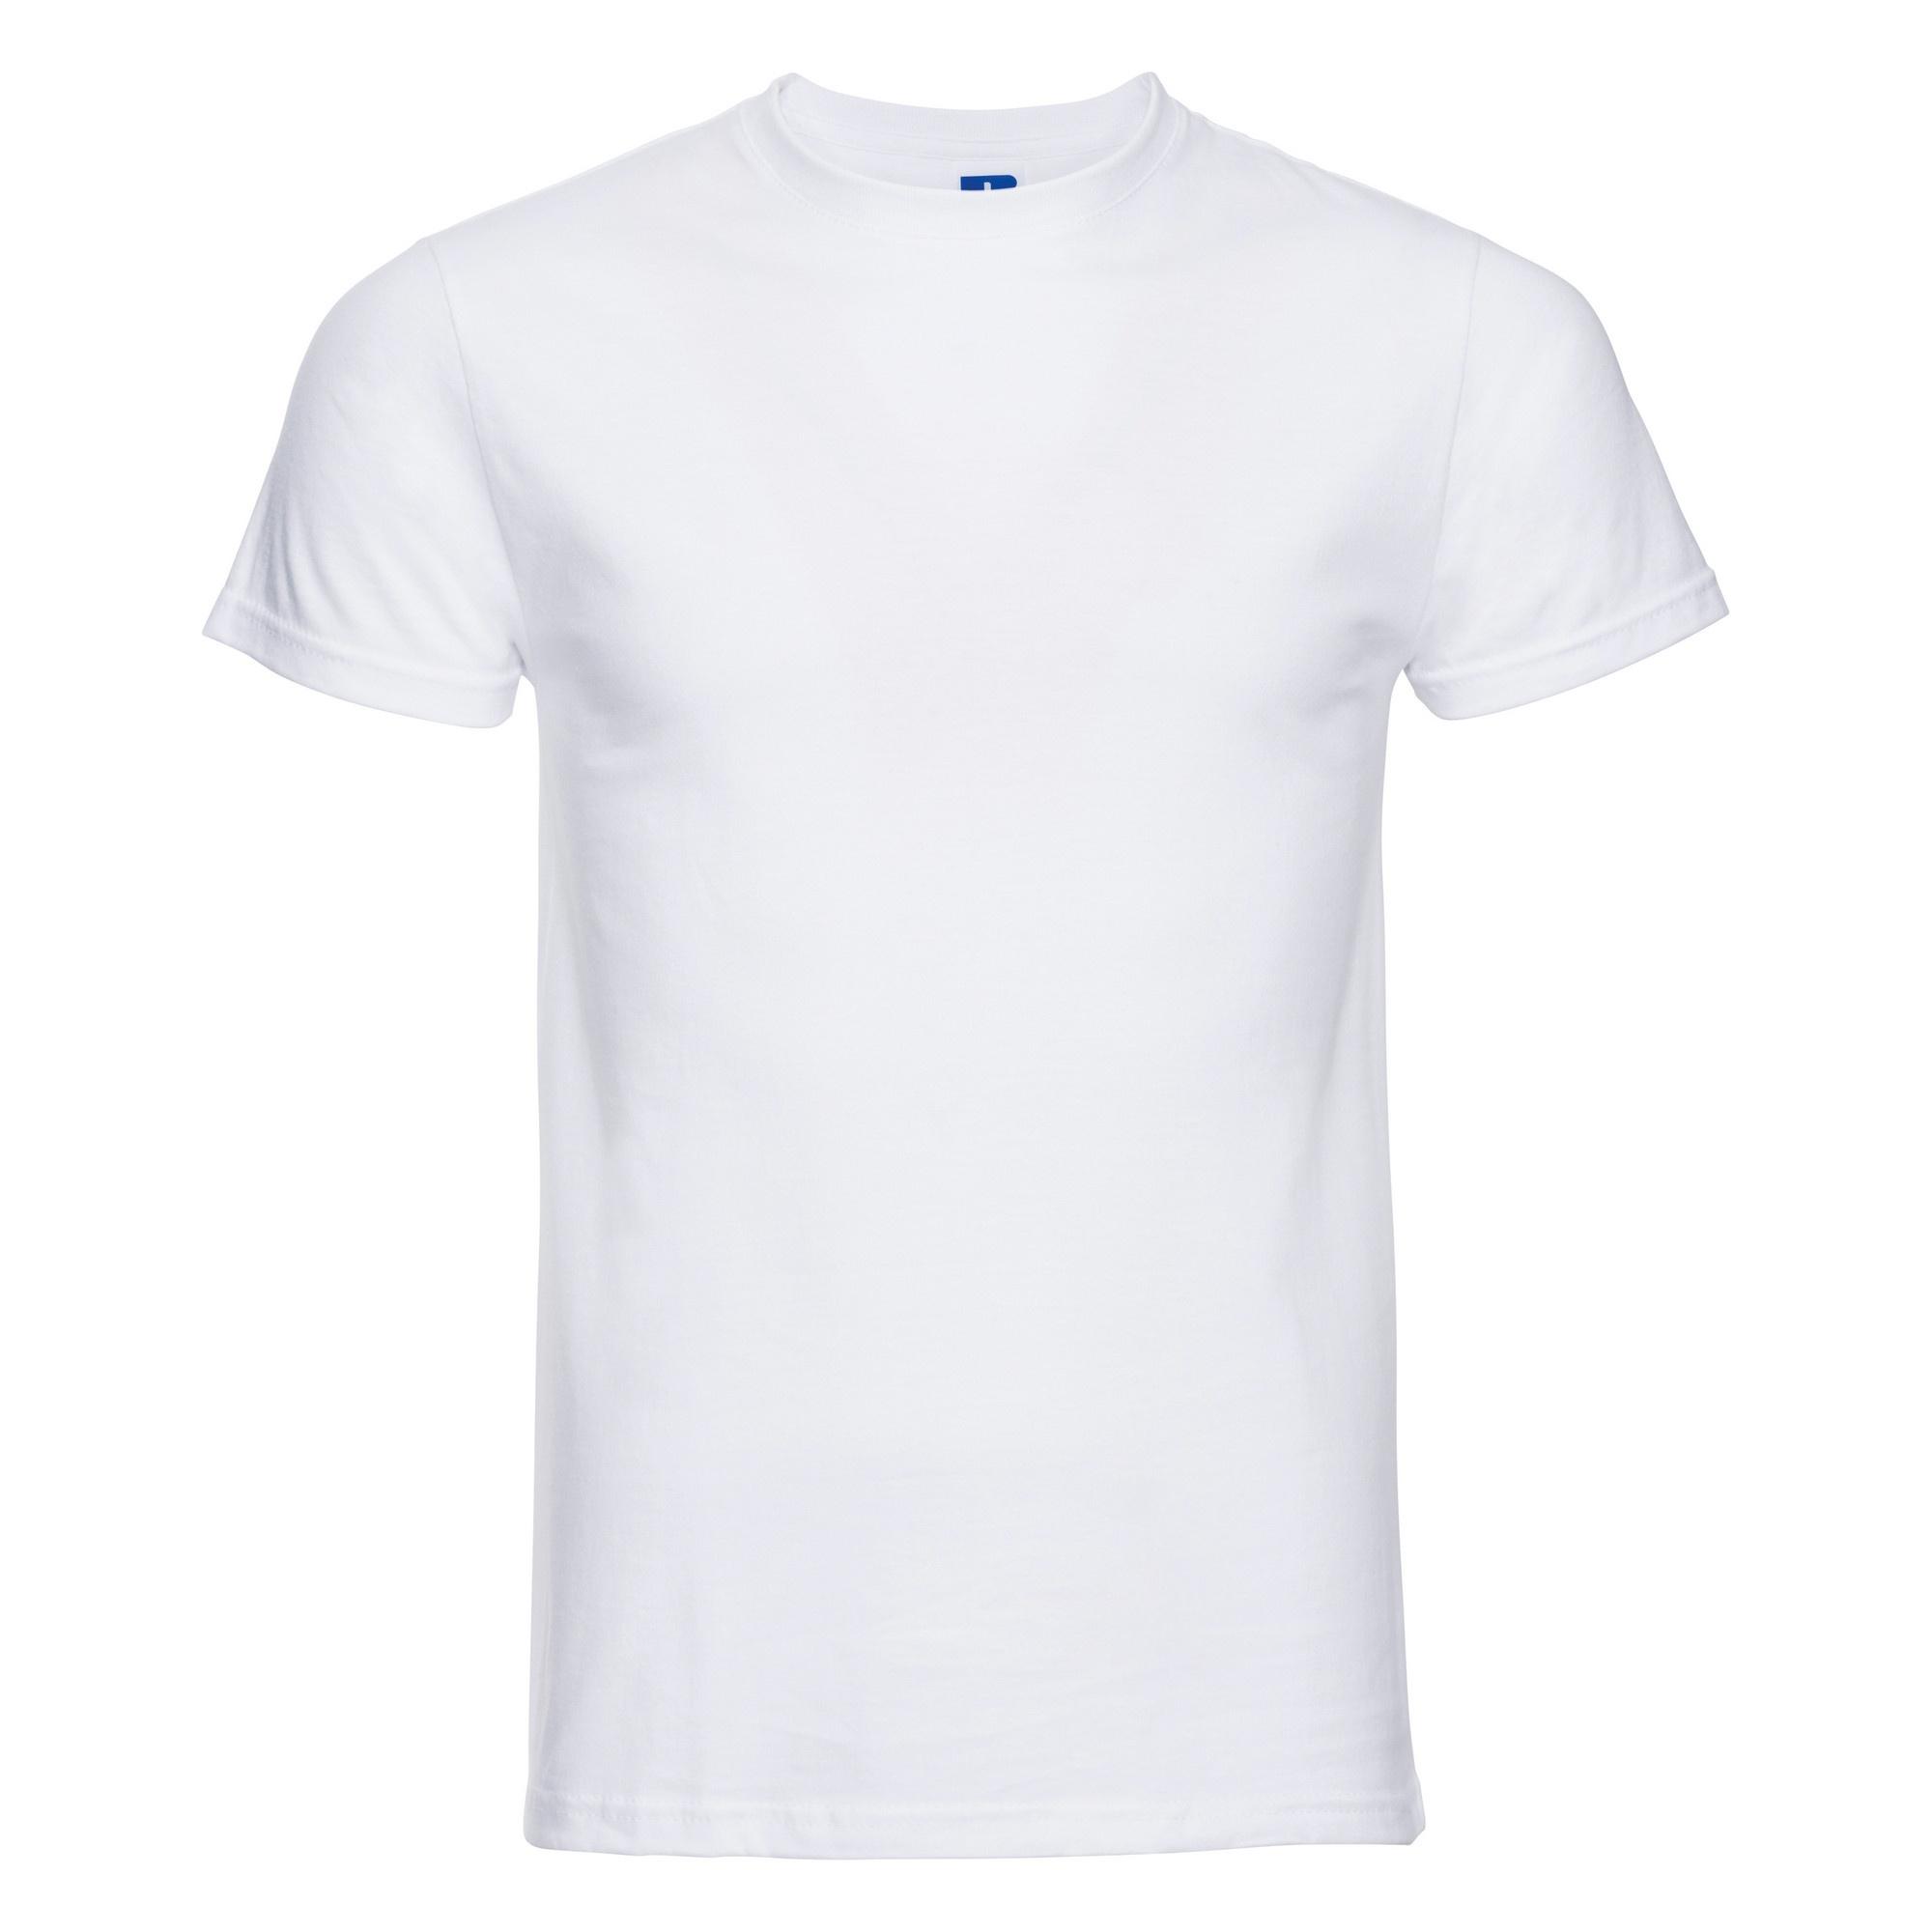 Russell-Mens-Slim-Plain-Blank-100-Cotton-Short-Sleeve-T-Shirt-Tee-BC1515 thumbnail 6